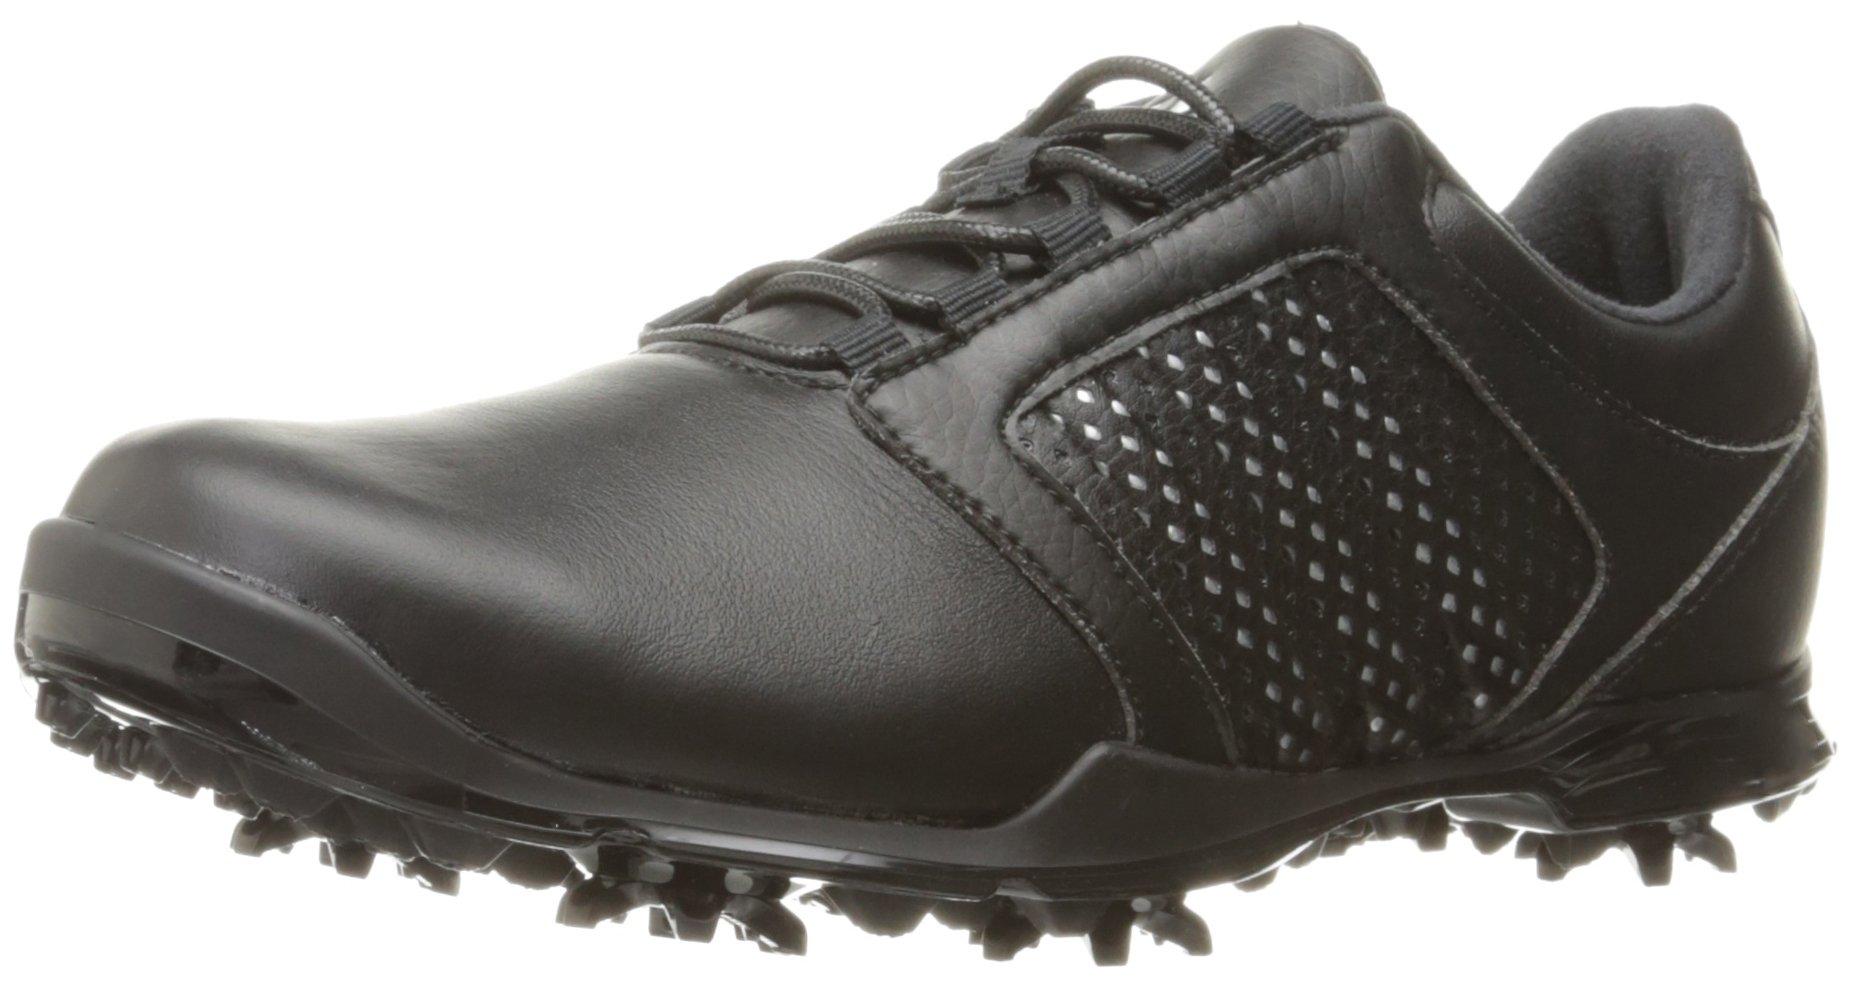 adidas Women's Adipure Tour Golf Shoe, Black, 6 M US